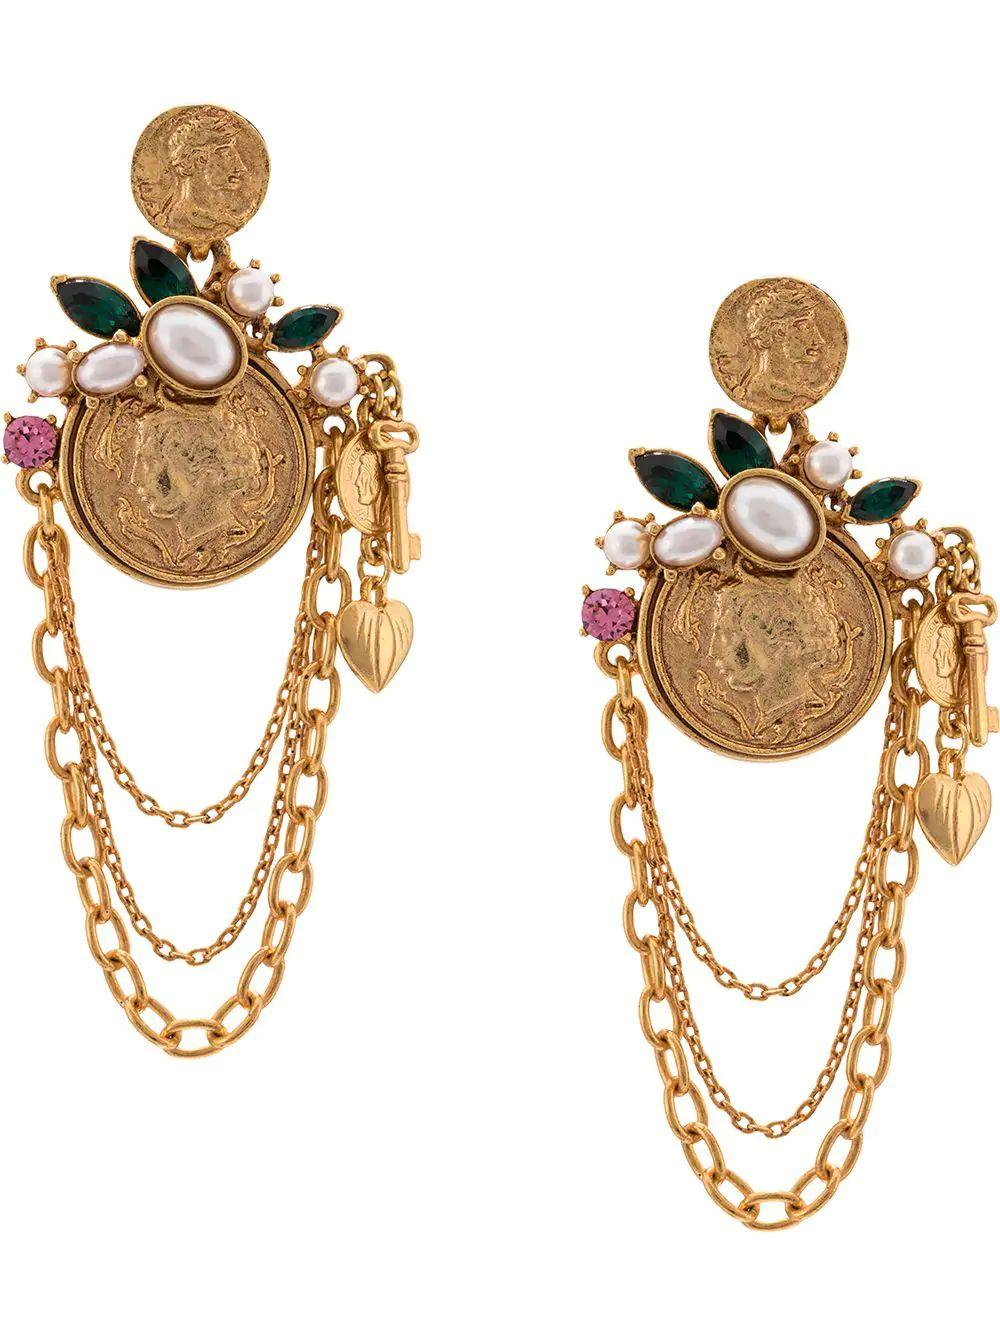 Coin/Charm Earring W/Chain Item # F19J112